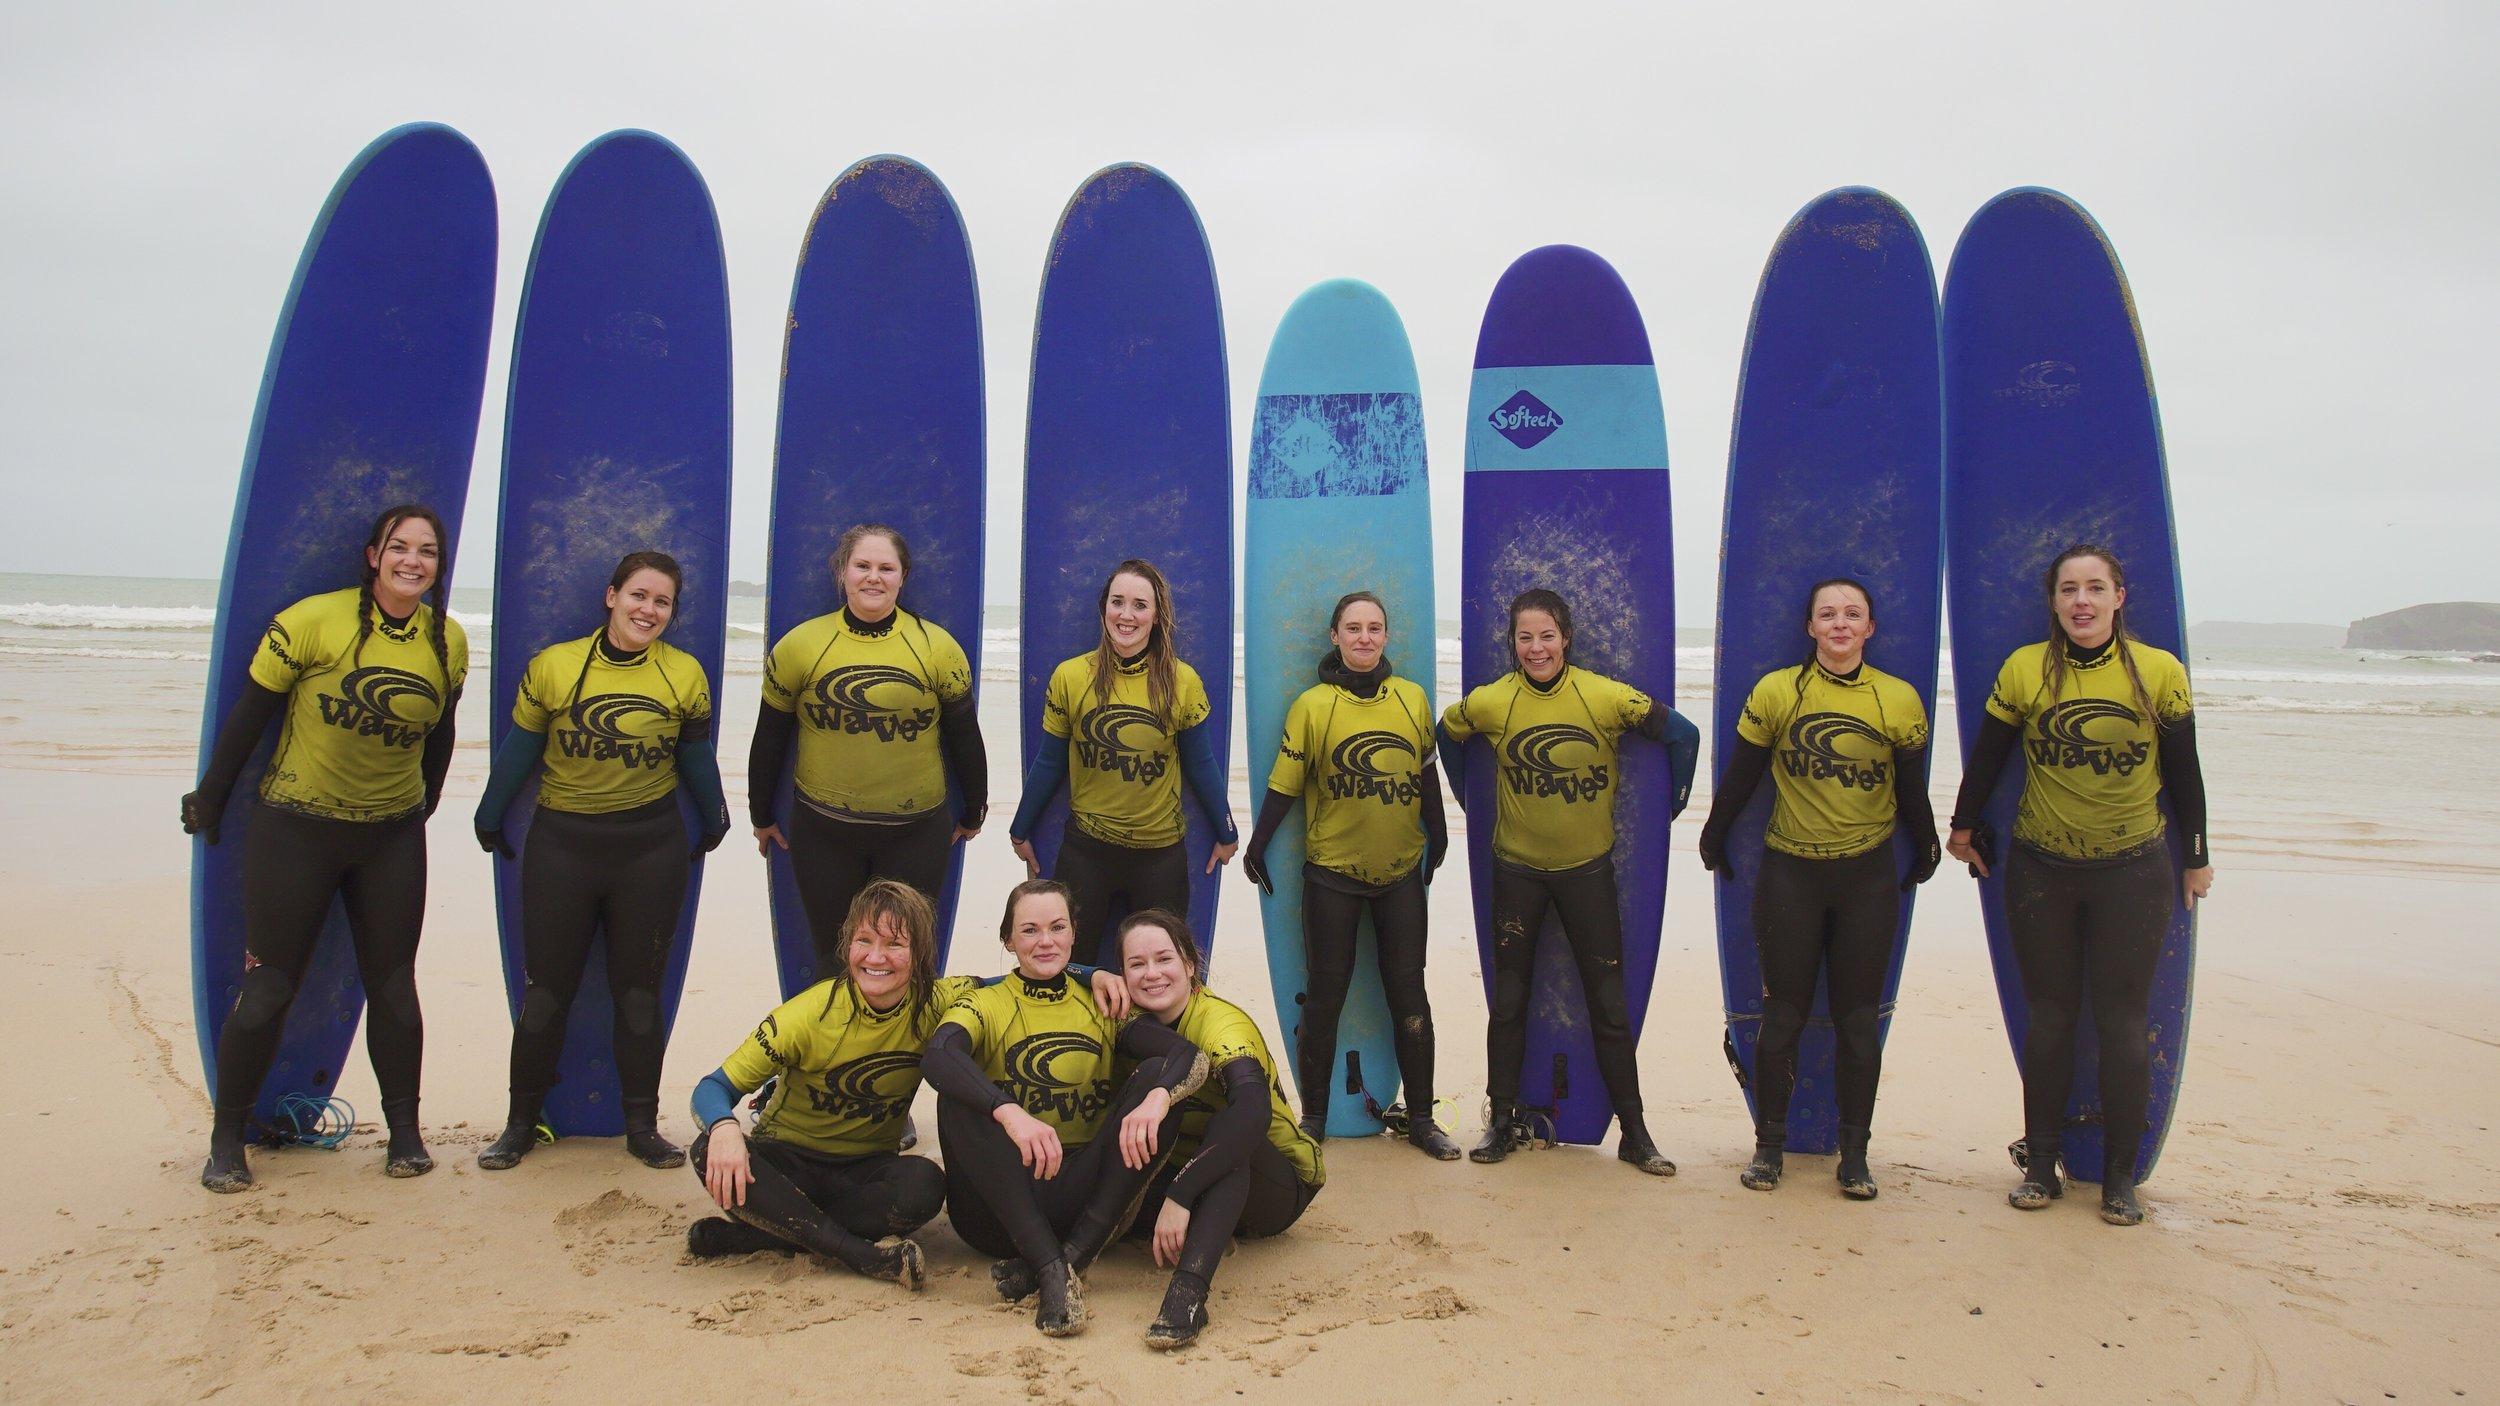 ride-on-retreats-harlyn-beach-cornwall.JPG